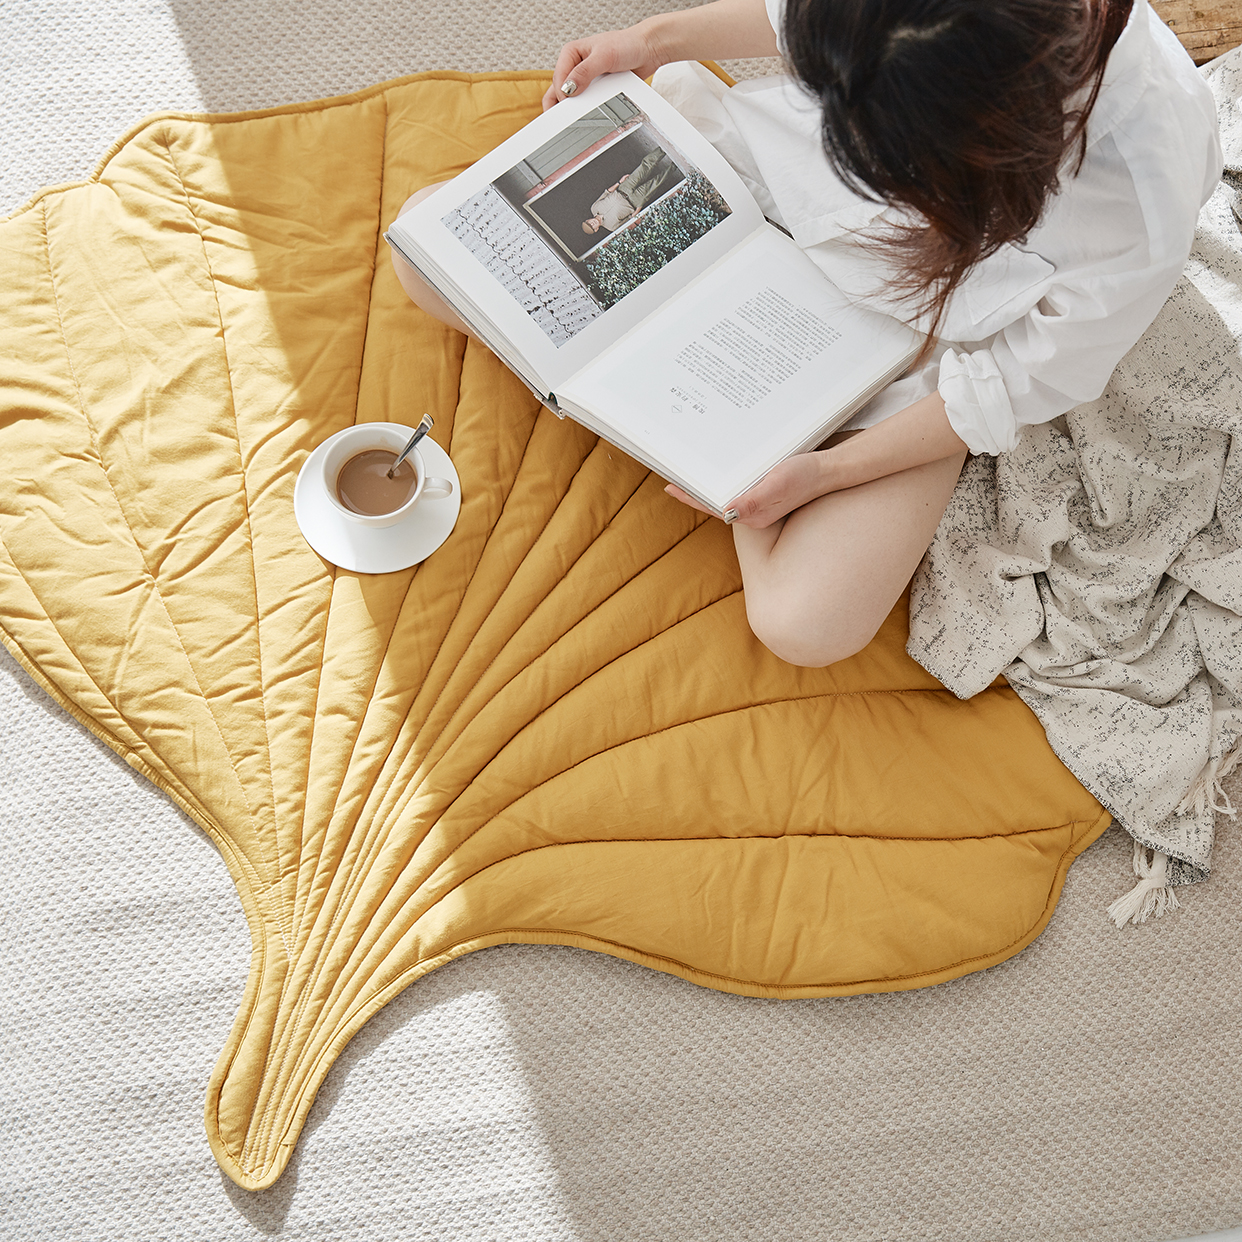 Nordic Leaf Rug Soft Cotton Floor Mat Rugs Baby Kids Bedroom Nursery Decor Carpet Blanket Living Room Home New Year Decoration